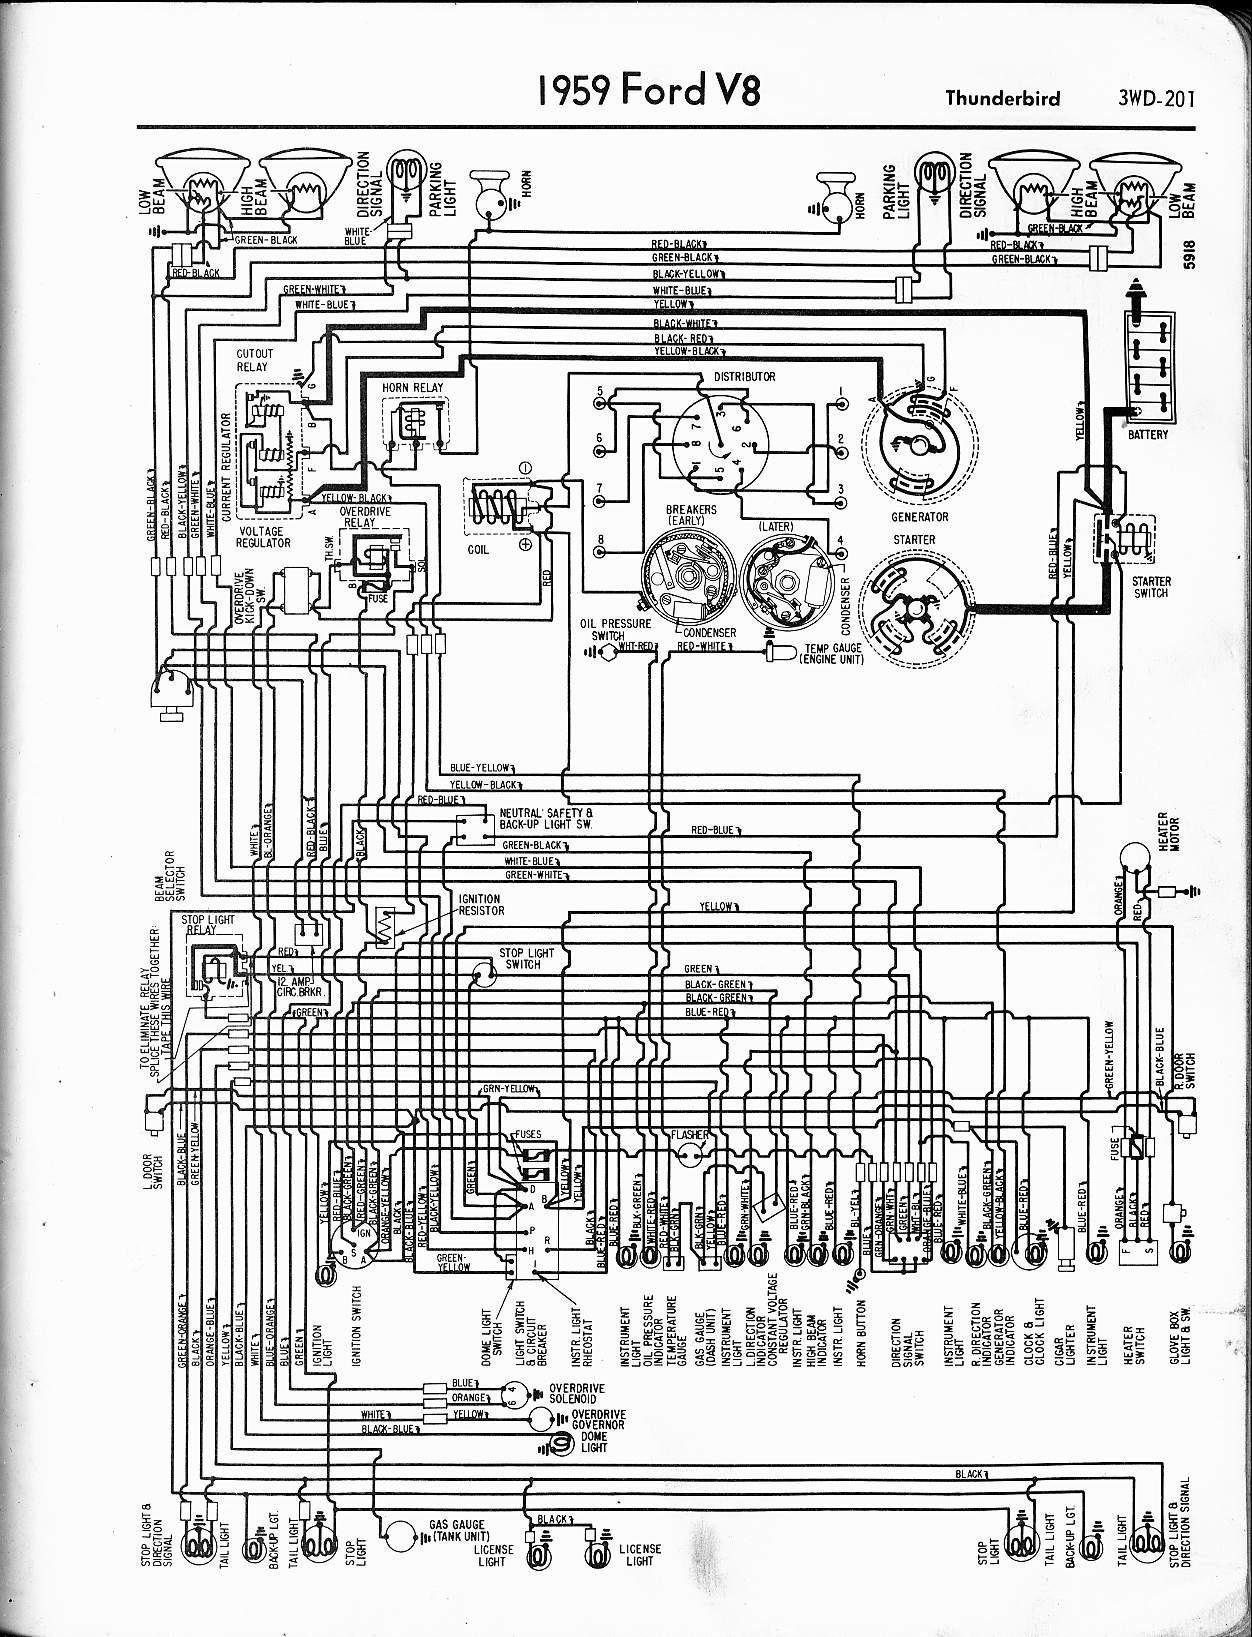 Ba Falcon Engine Diagram 57 65 ford Wiring Diagrams Of Ba Falcon Engine Diagram